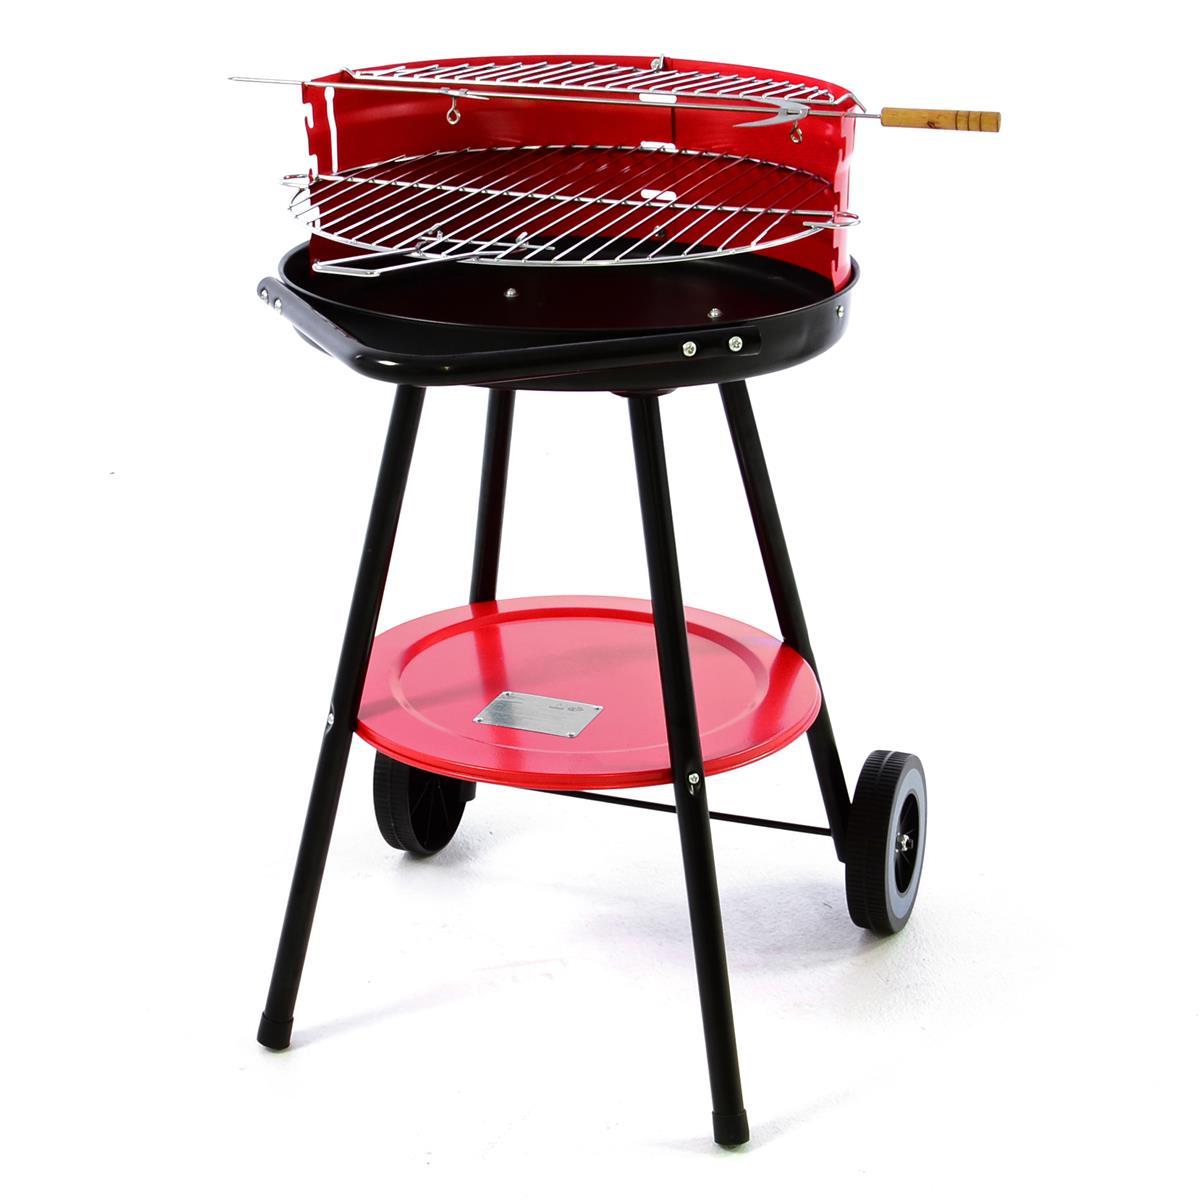 Rundgrill mit Ablage BBQ Grill Holzkohlegrill rot 70x40 cm Rost verstellbar